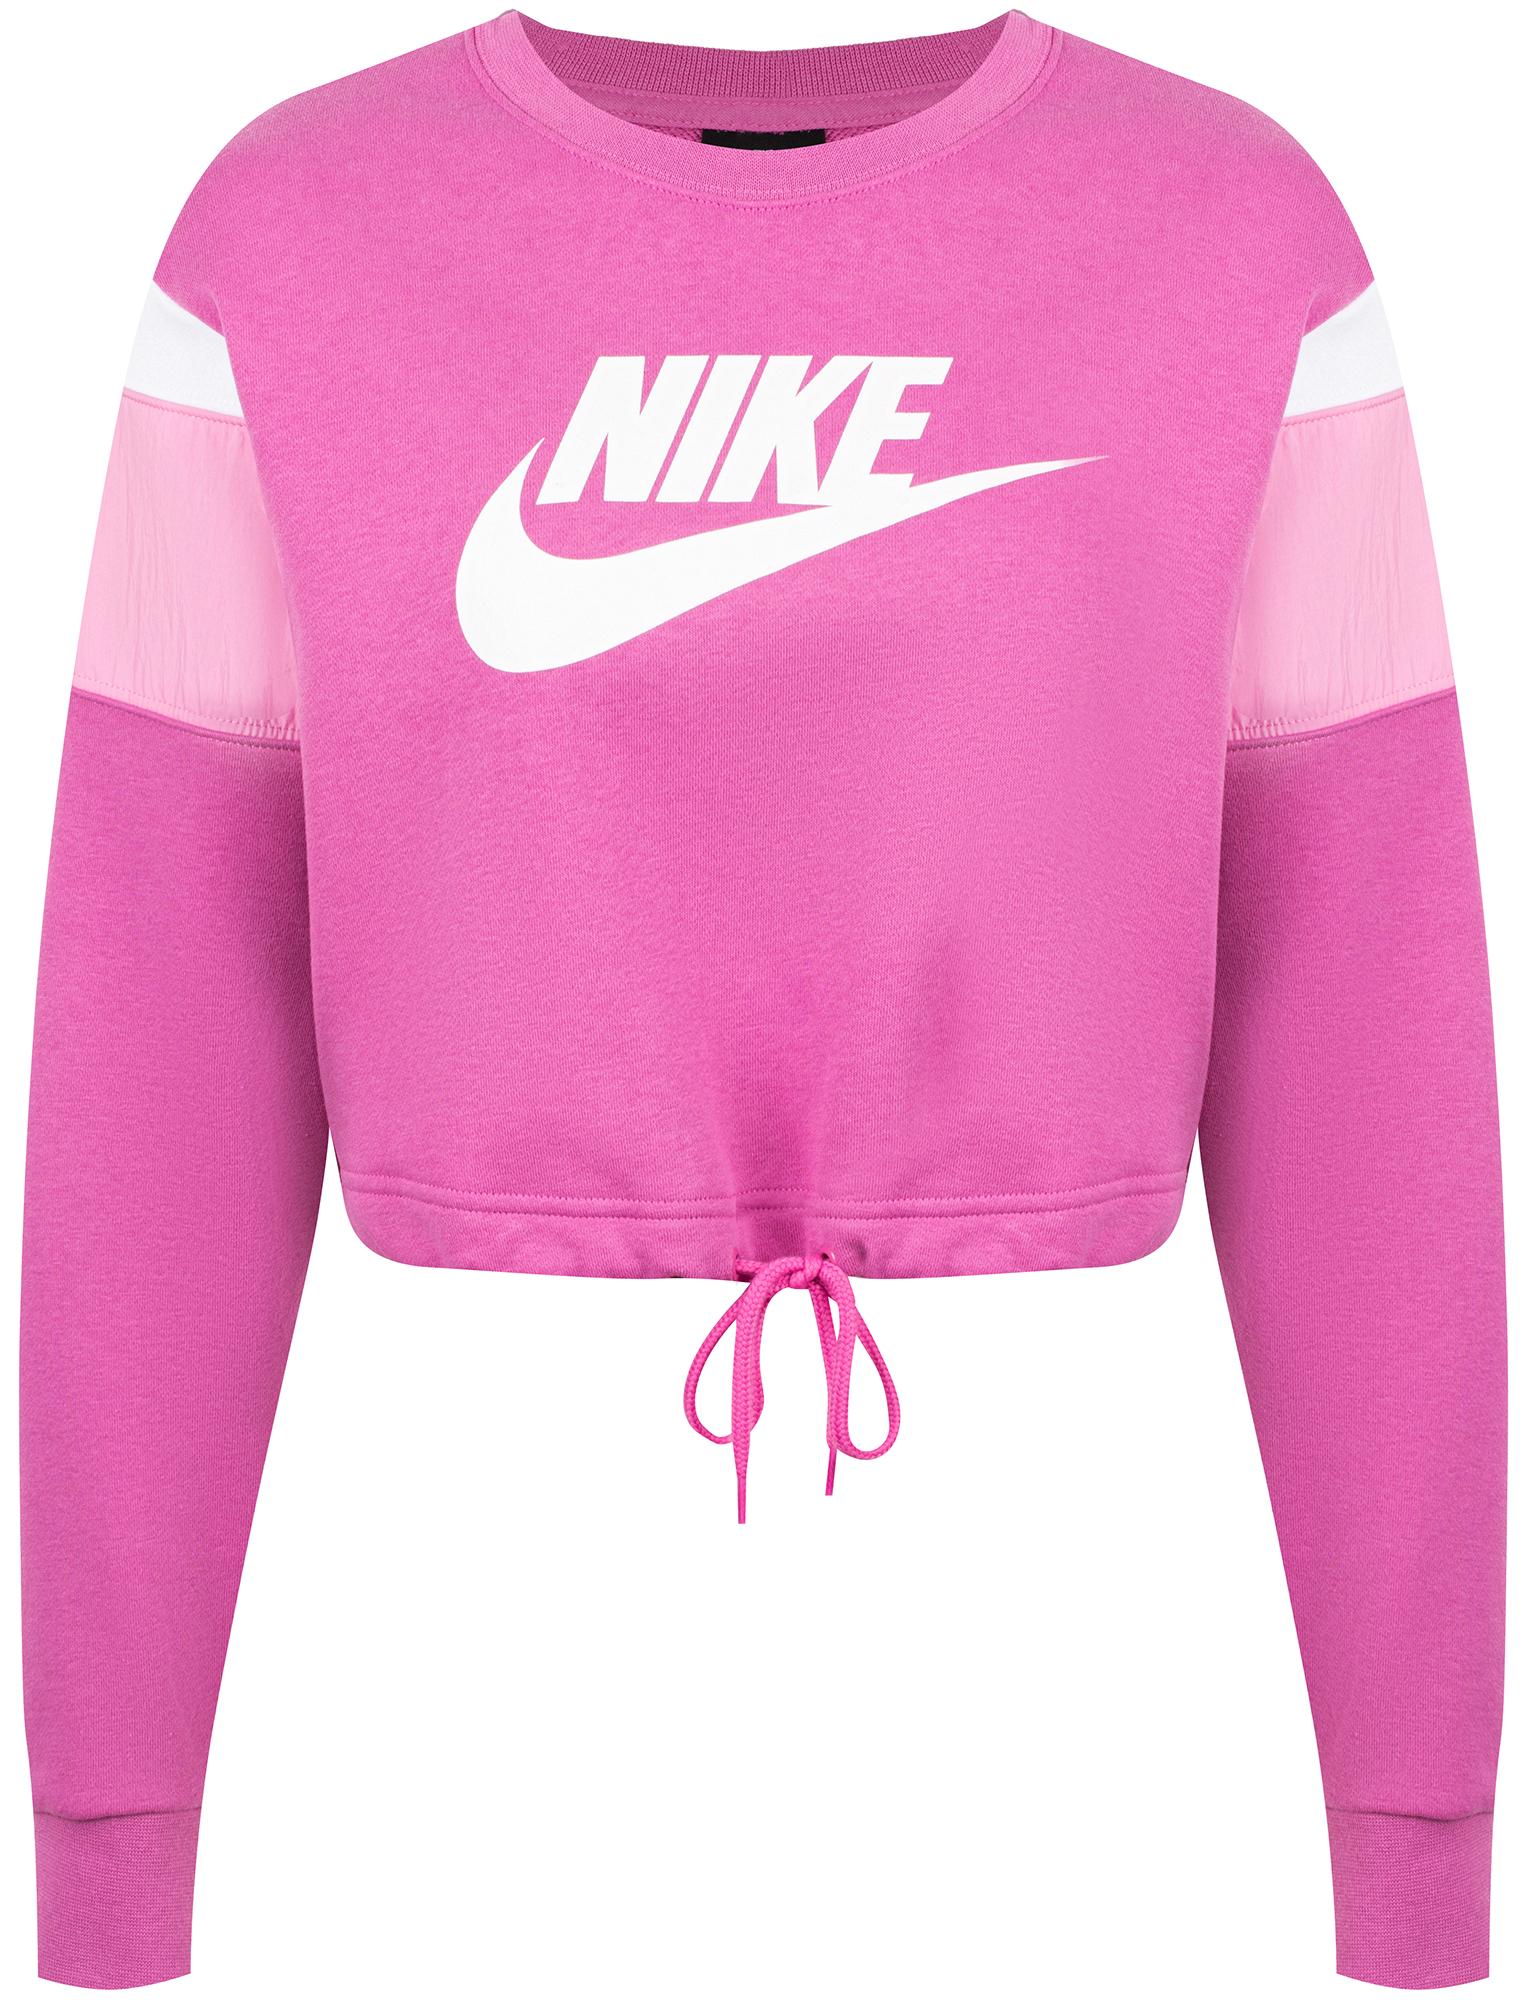 Nike Свитшот женский Sportswear Heritage, размер 40-42